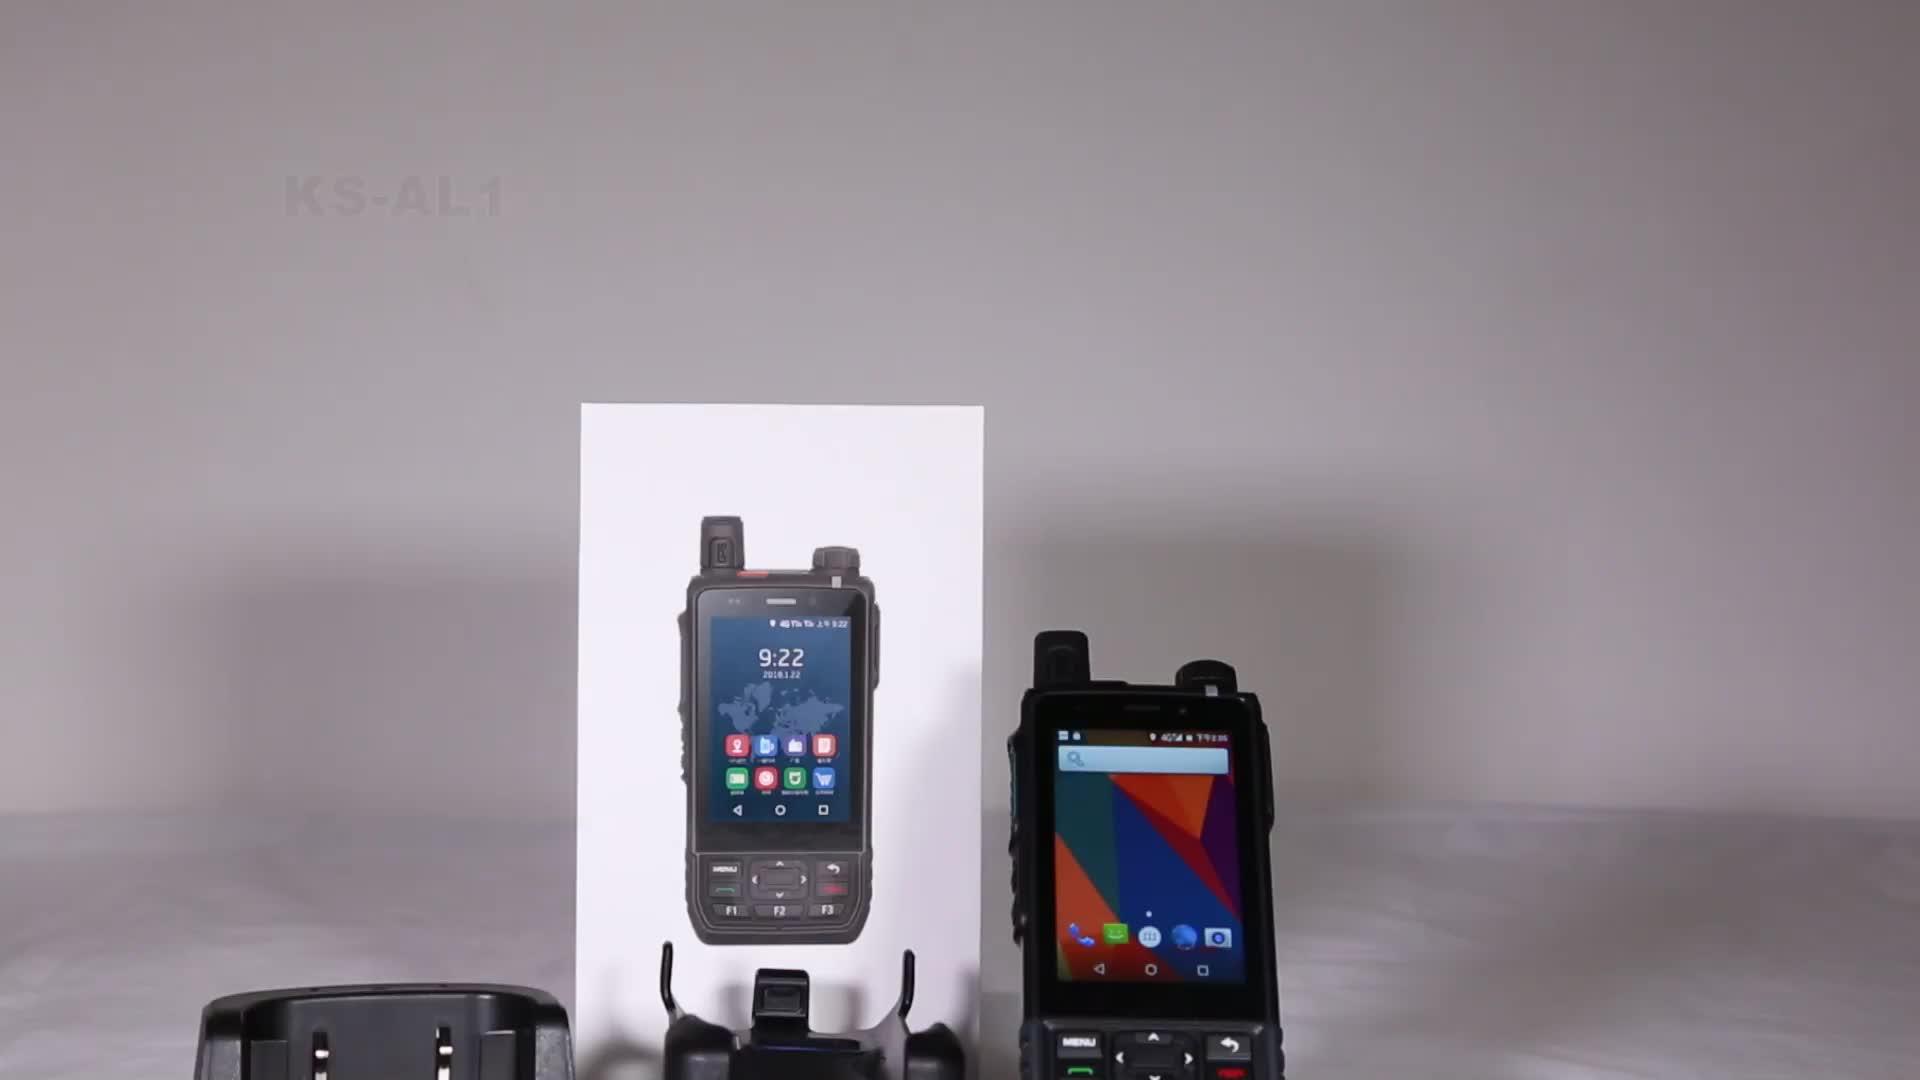 KSUN KSXAL1 Zello Walkie Talkie 4G WCDMA, CDMA, GSM Visualization Intercom GPS Positioning Sim Card Mobile Phone Two Way Radio